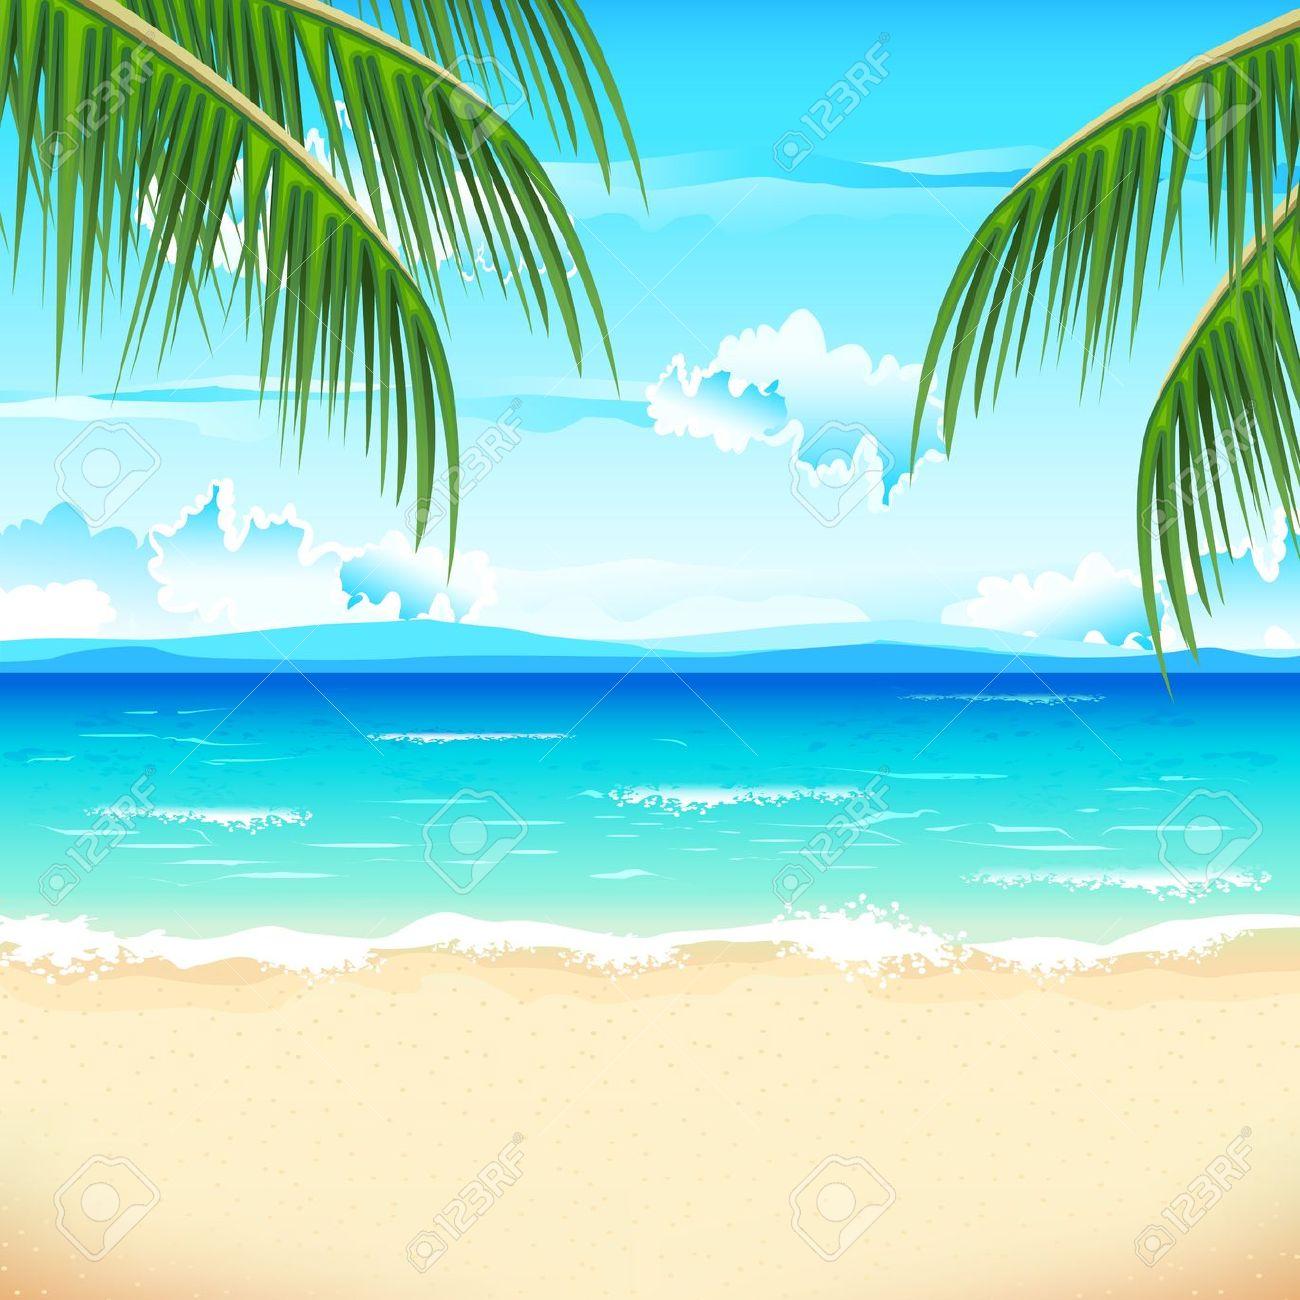 Beach Scene Stock Illustrations Cliparts-Beach Scene Stock Illustrations Cliparts And Royalty Free Beach-6